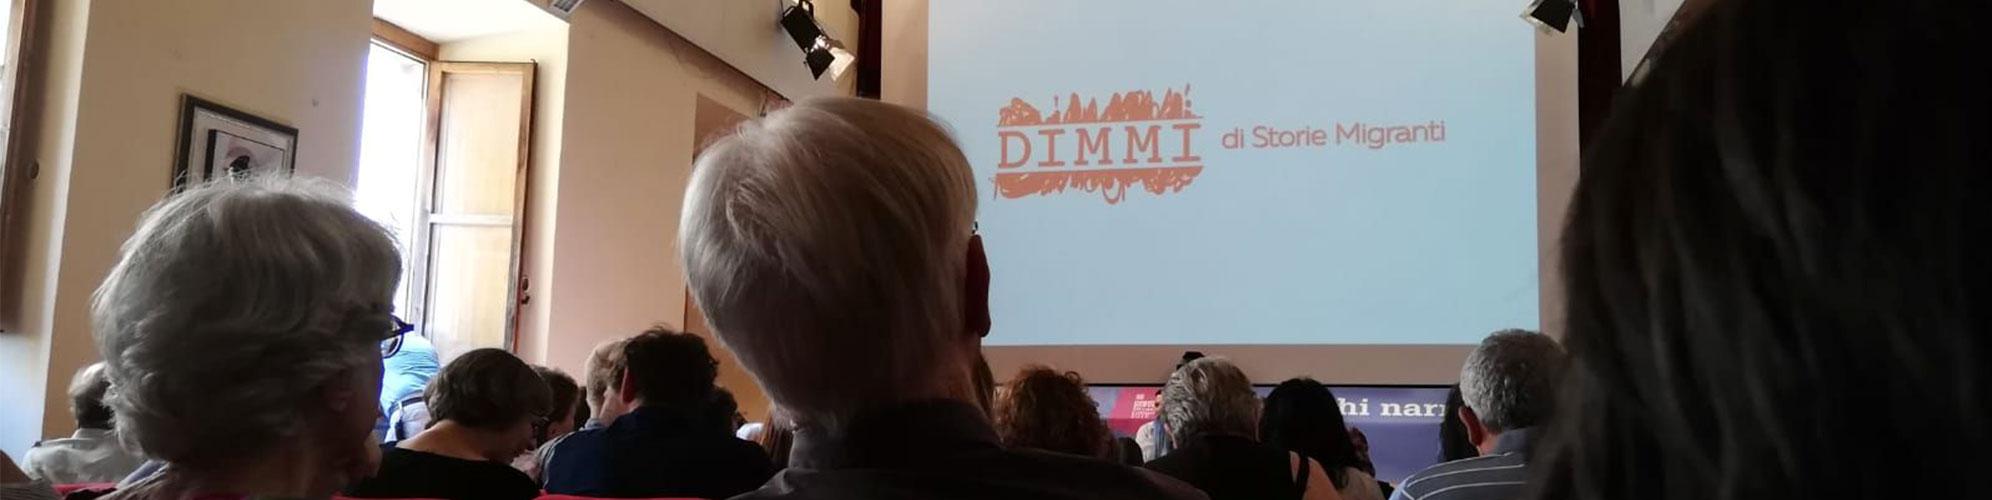 DIMMI_presentazione1_inner